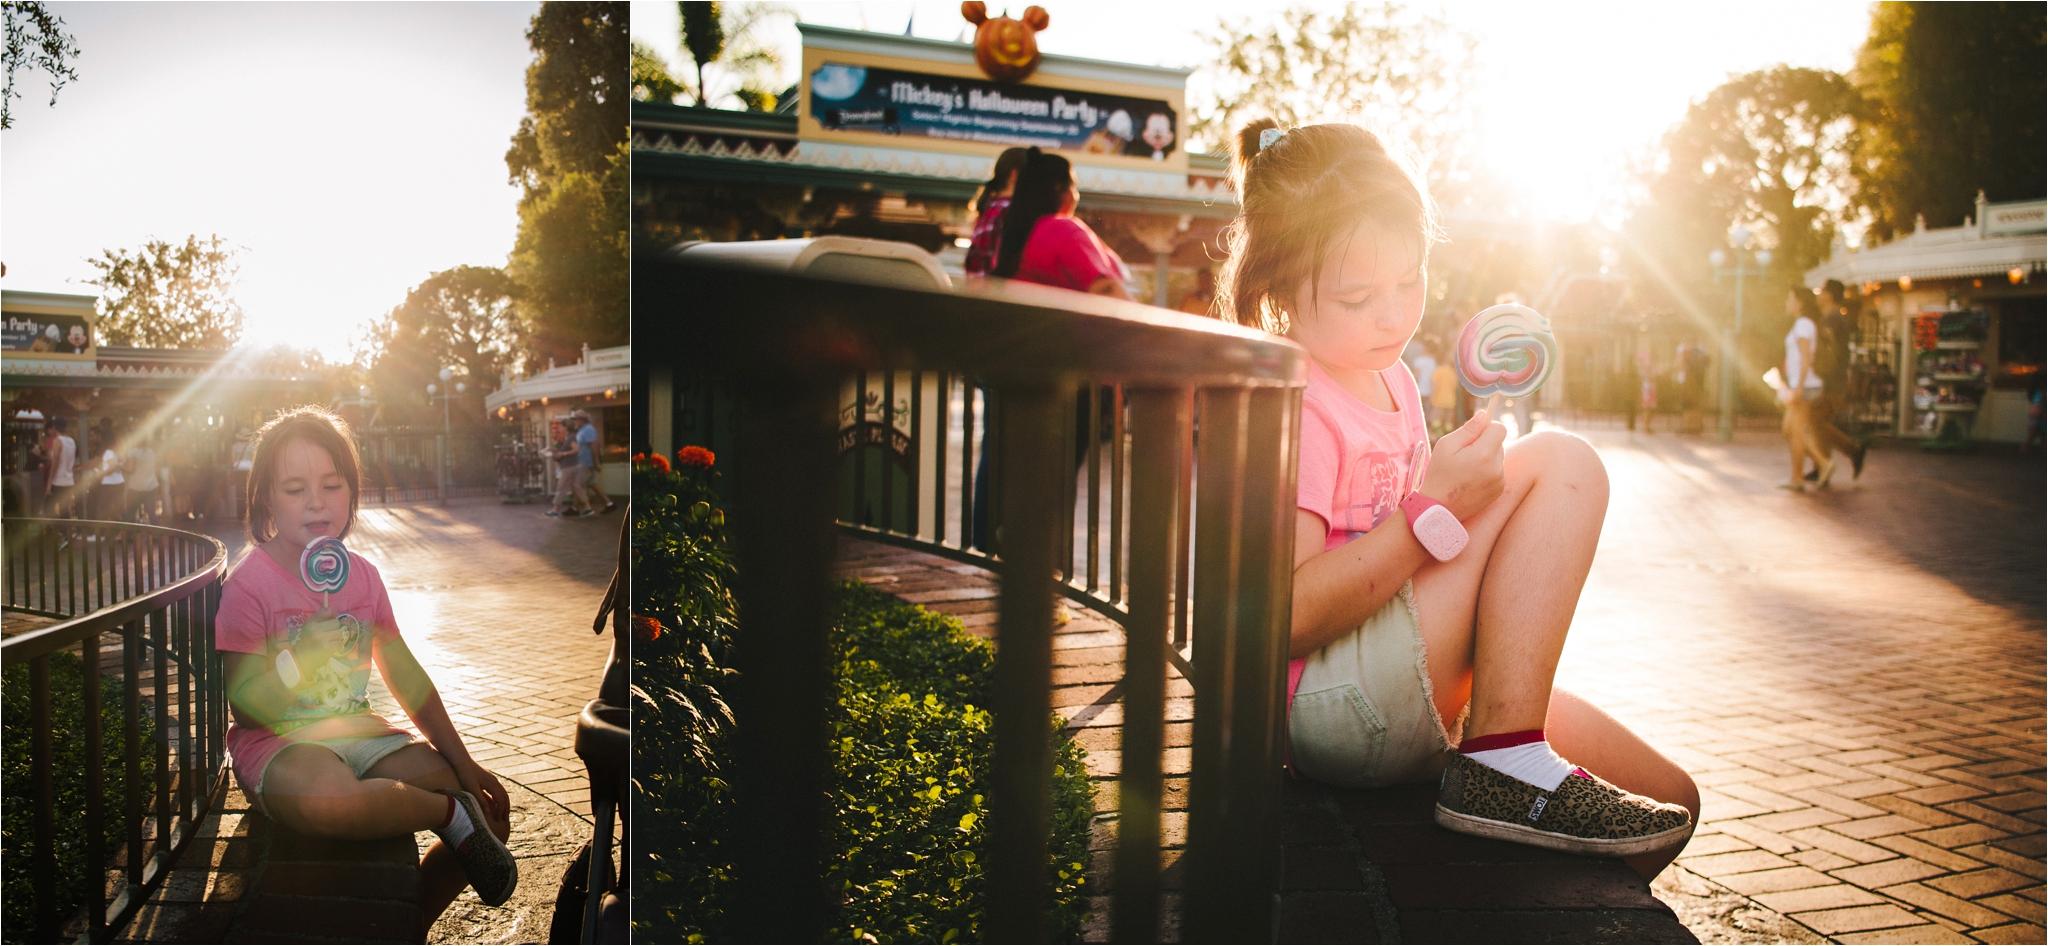 Disneylandroundtwopersonalimages_0035.jpg